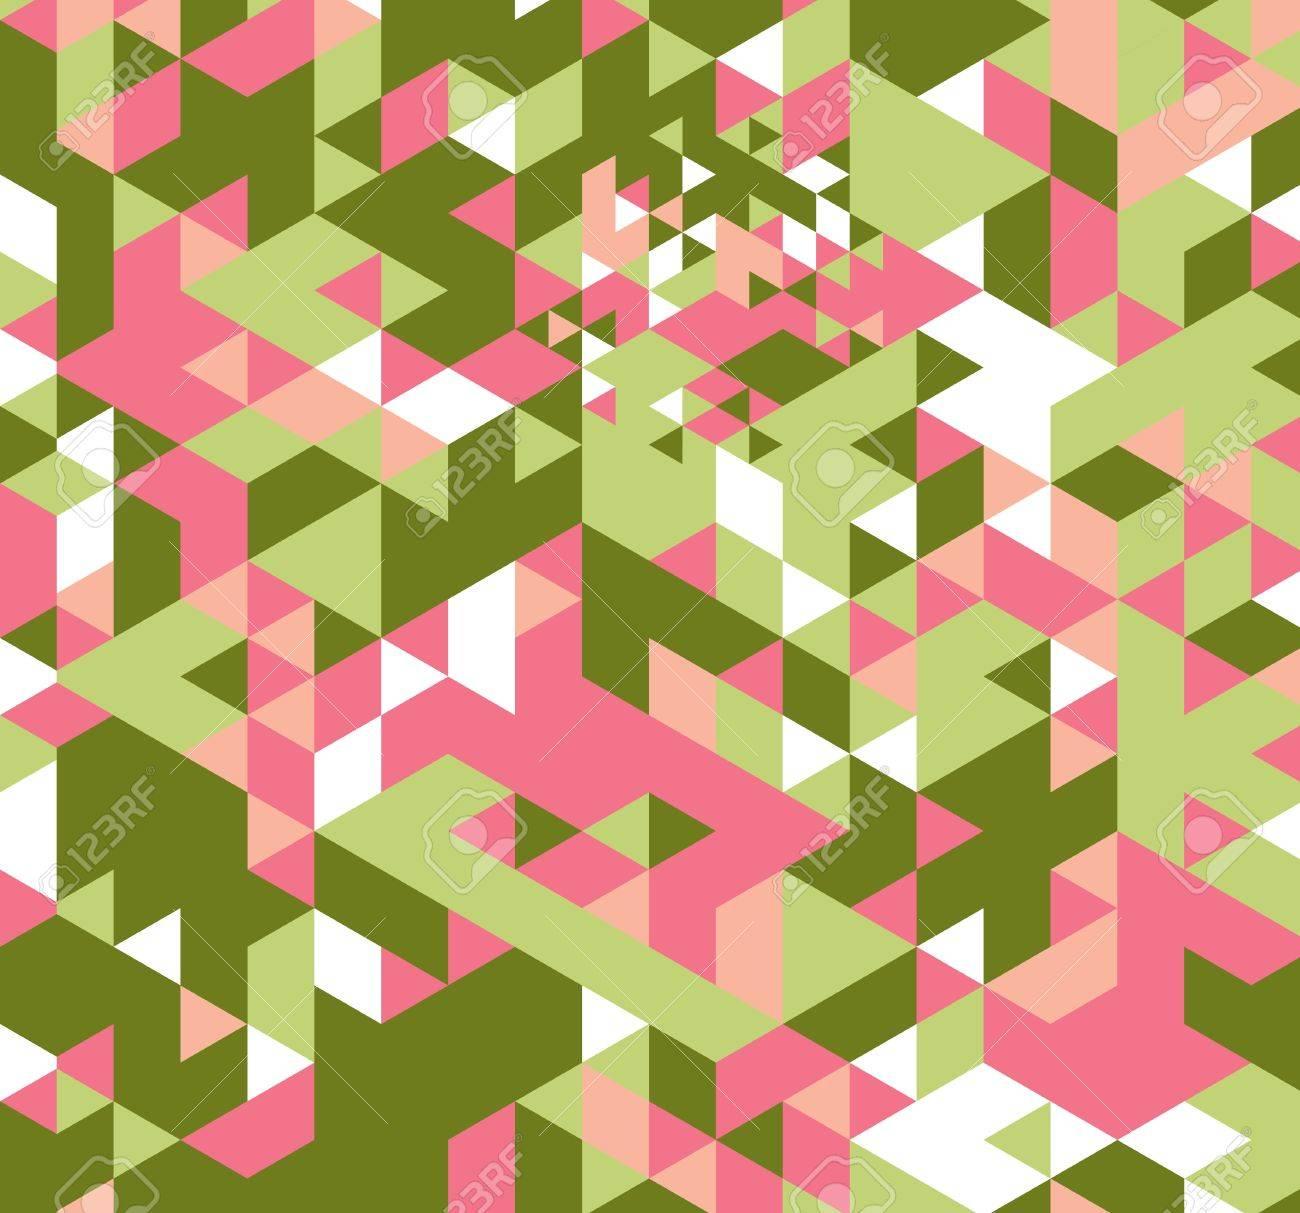 Geometric hipster retro background. Retro triangle vector background Stock Photo - 21151396